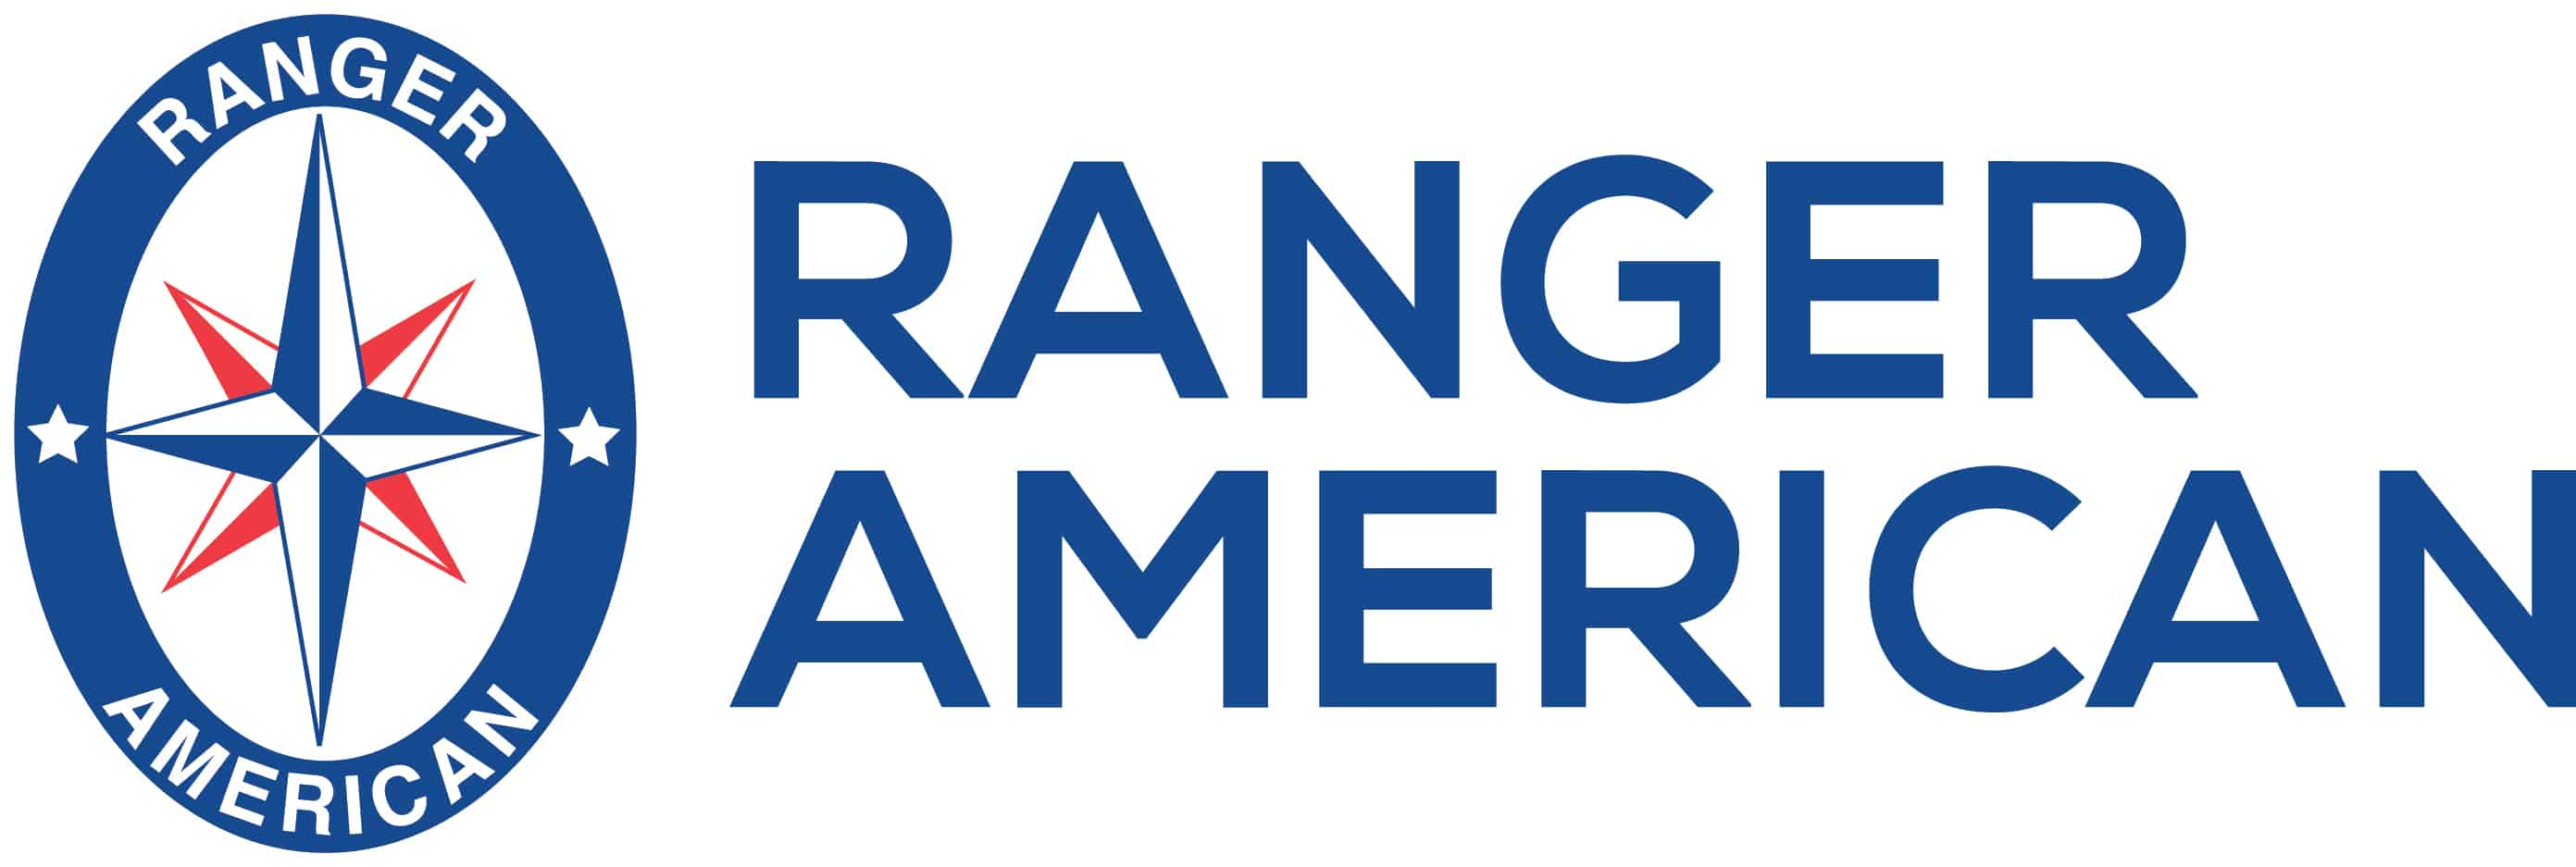 ranger alarm manual